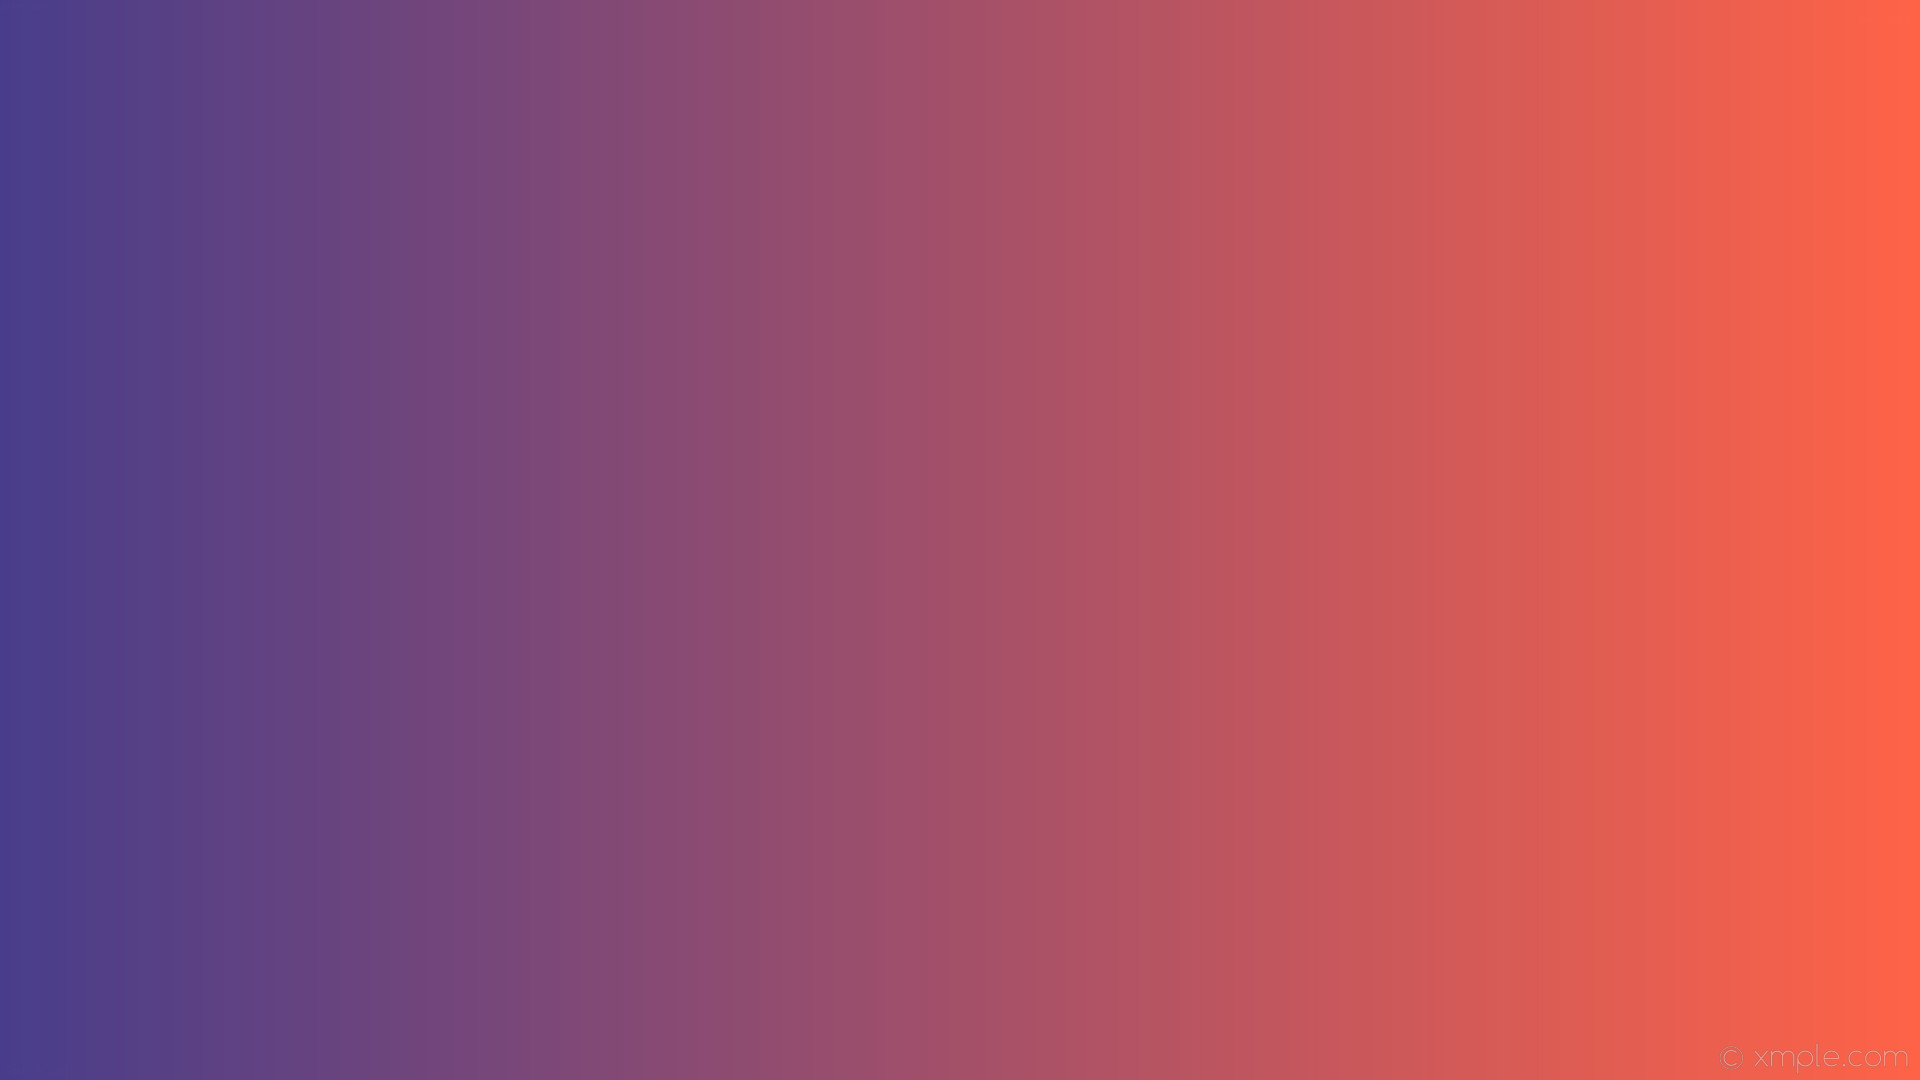 wallpaper linear gradient orange purple dark slate blue tomato #483d8b  #ff6347 180°